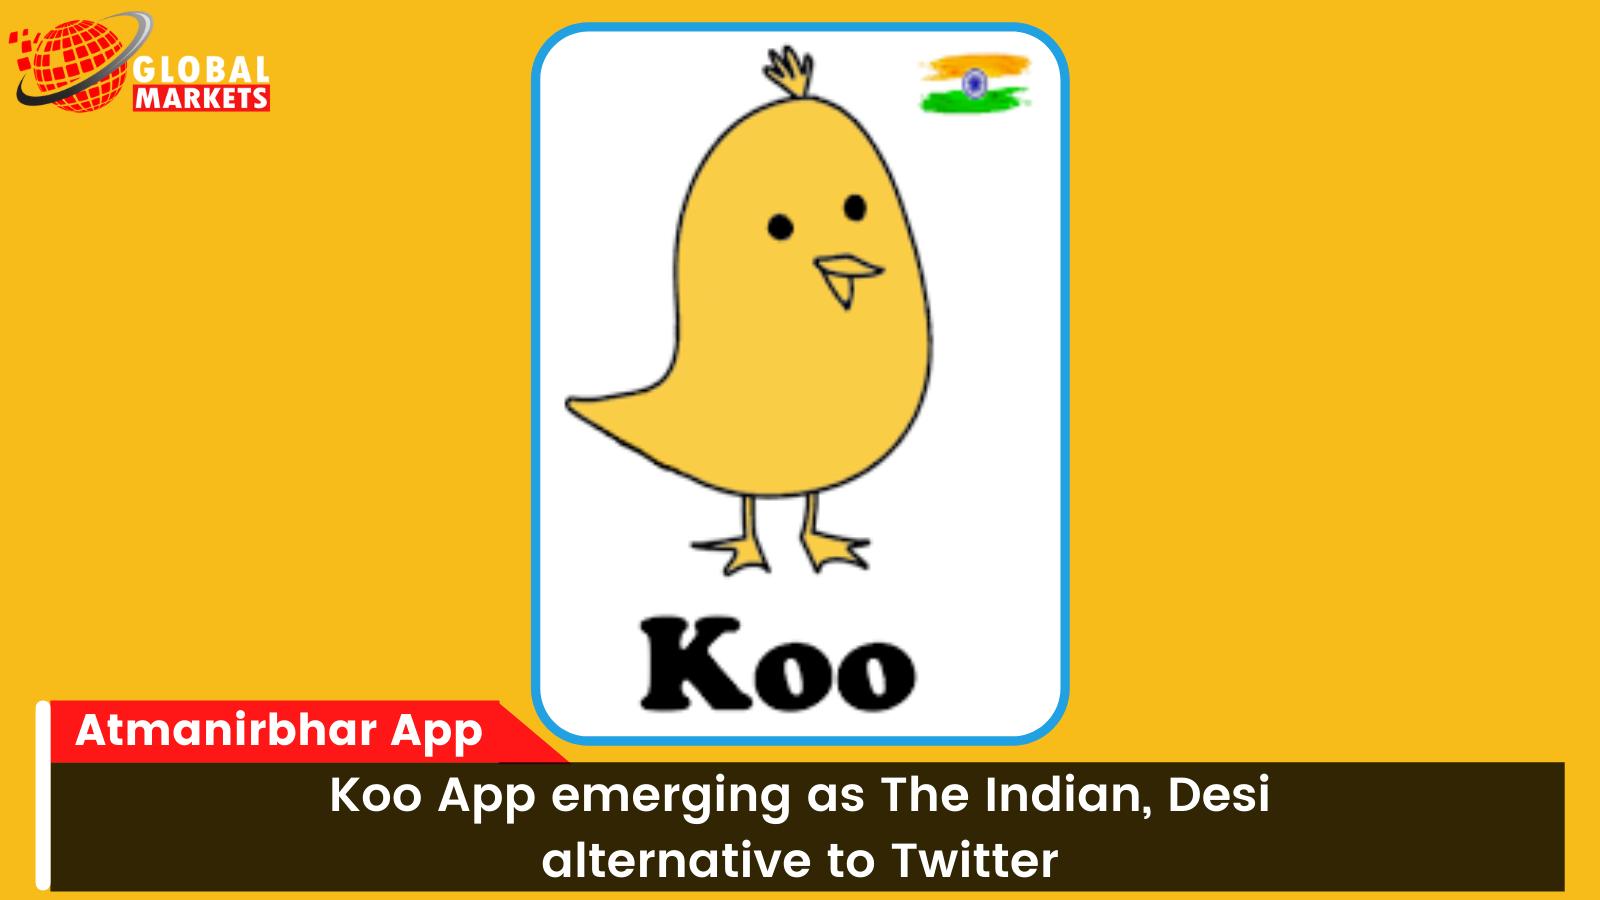 Koo App emerging as The Indian, Desi alternative to Twitter